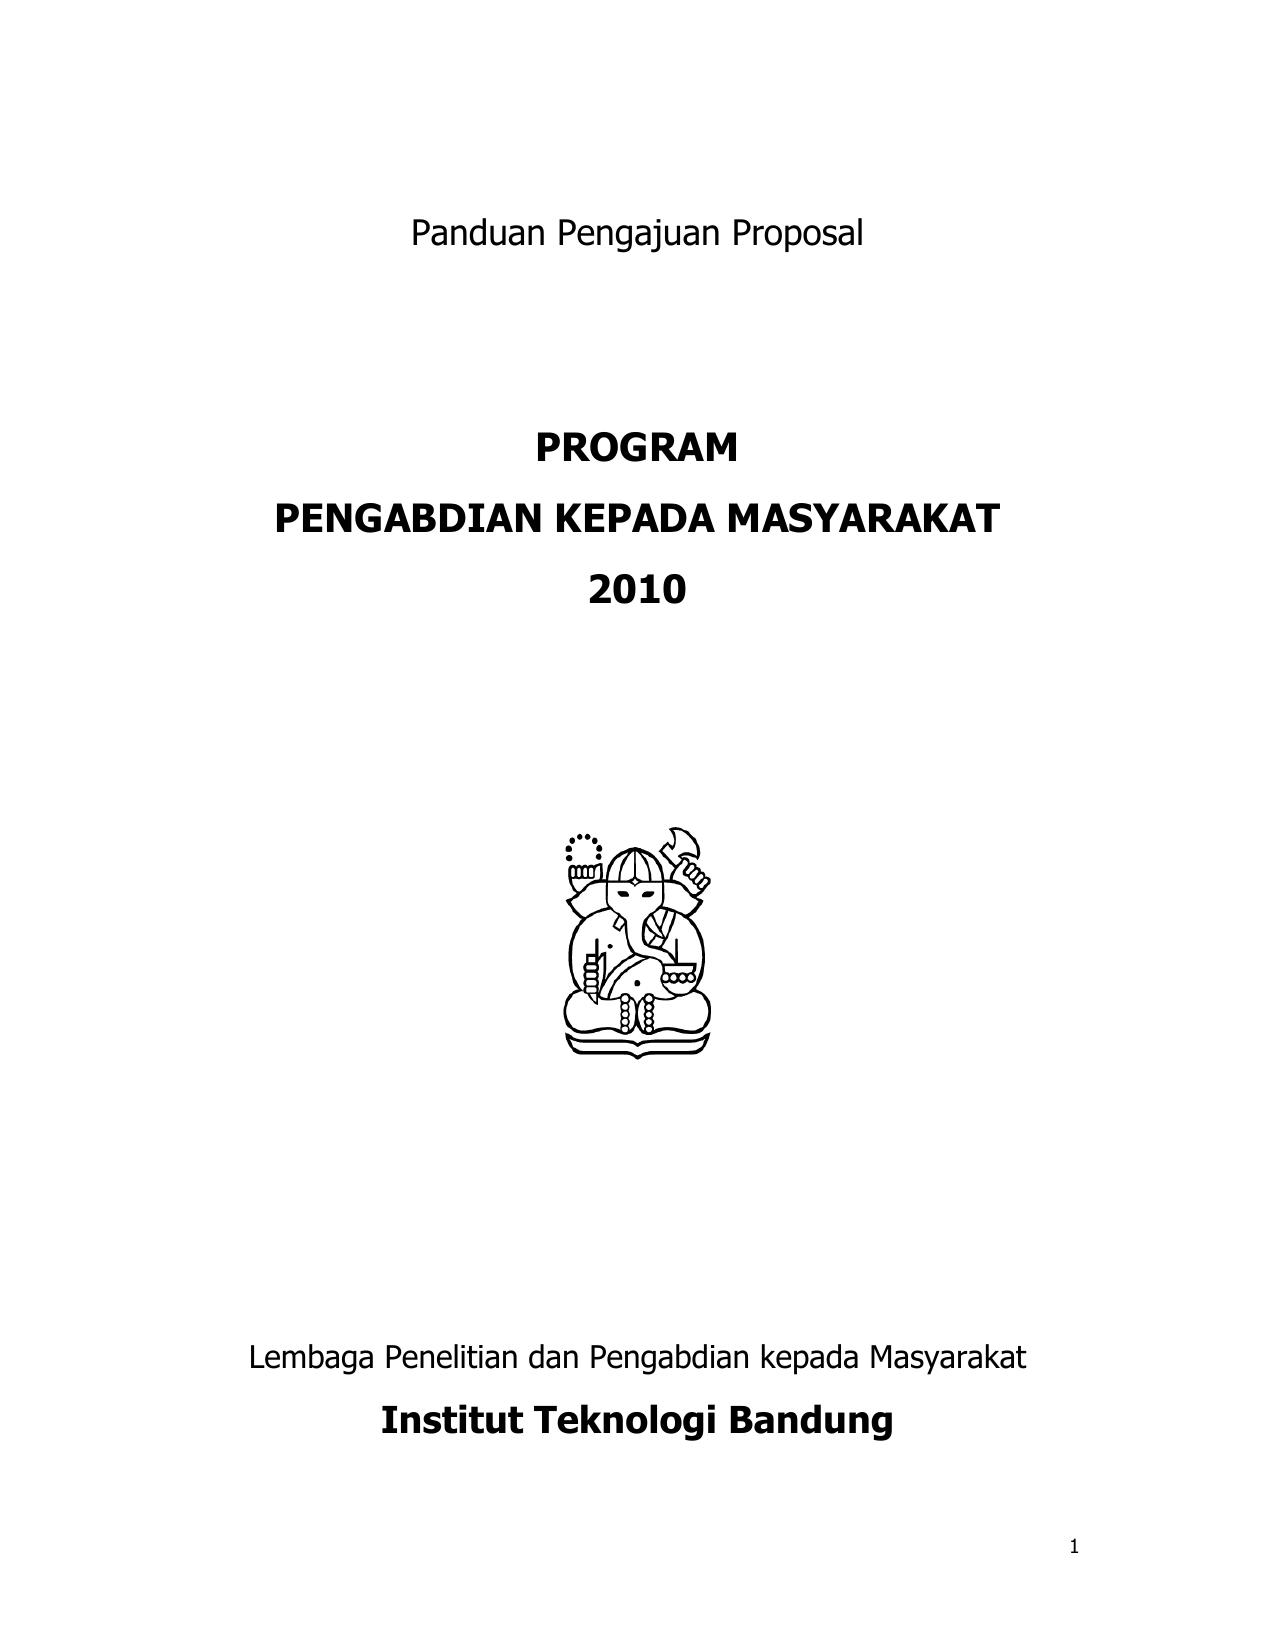 Program Pengabdian Kepada Masyarakat 2010